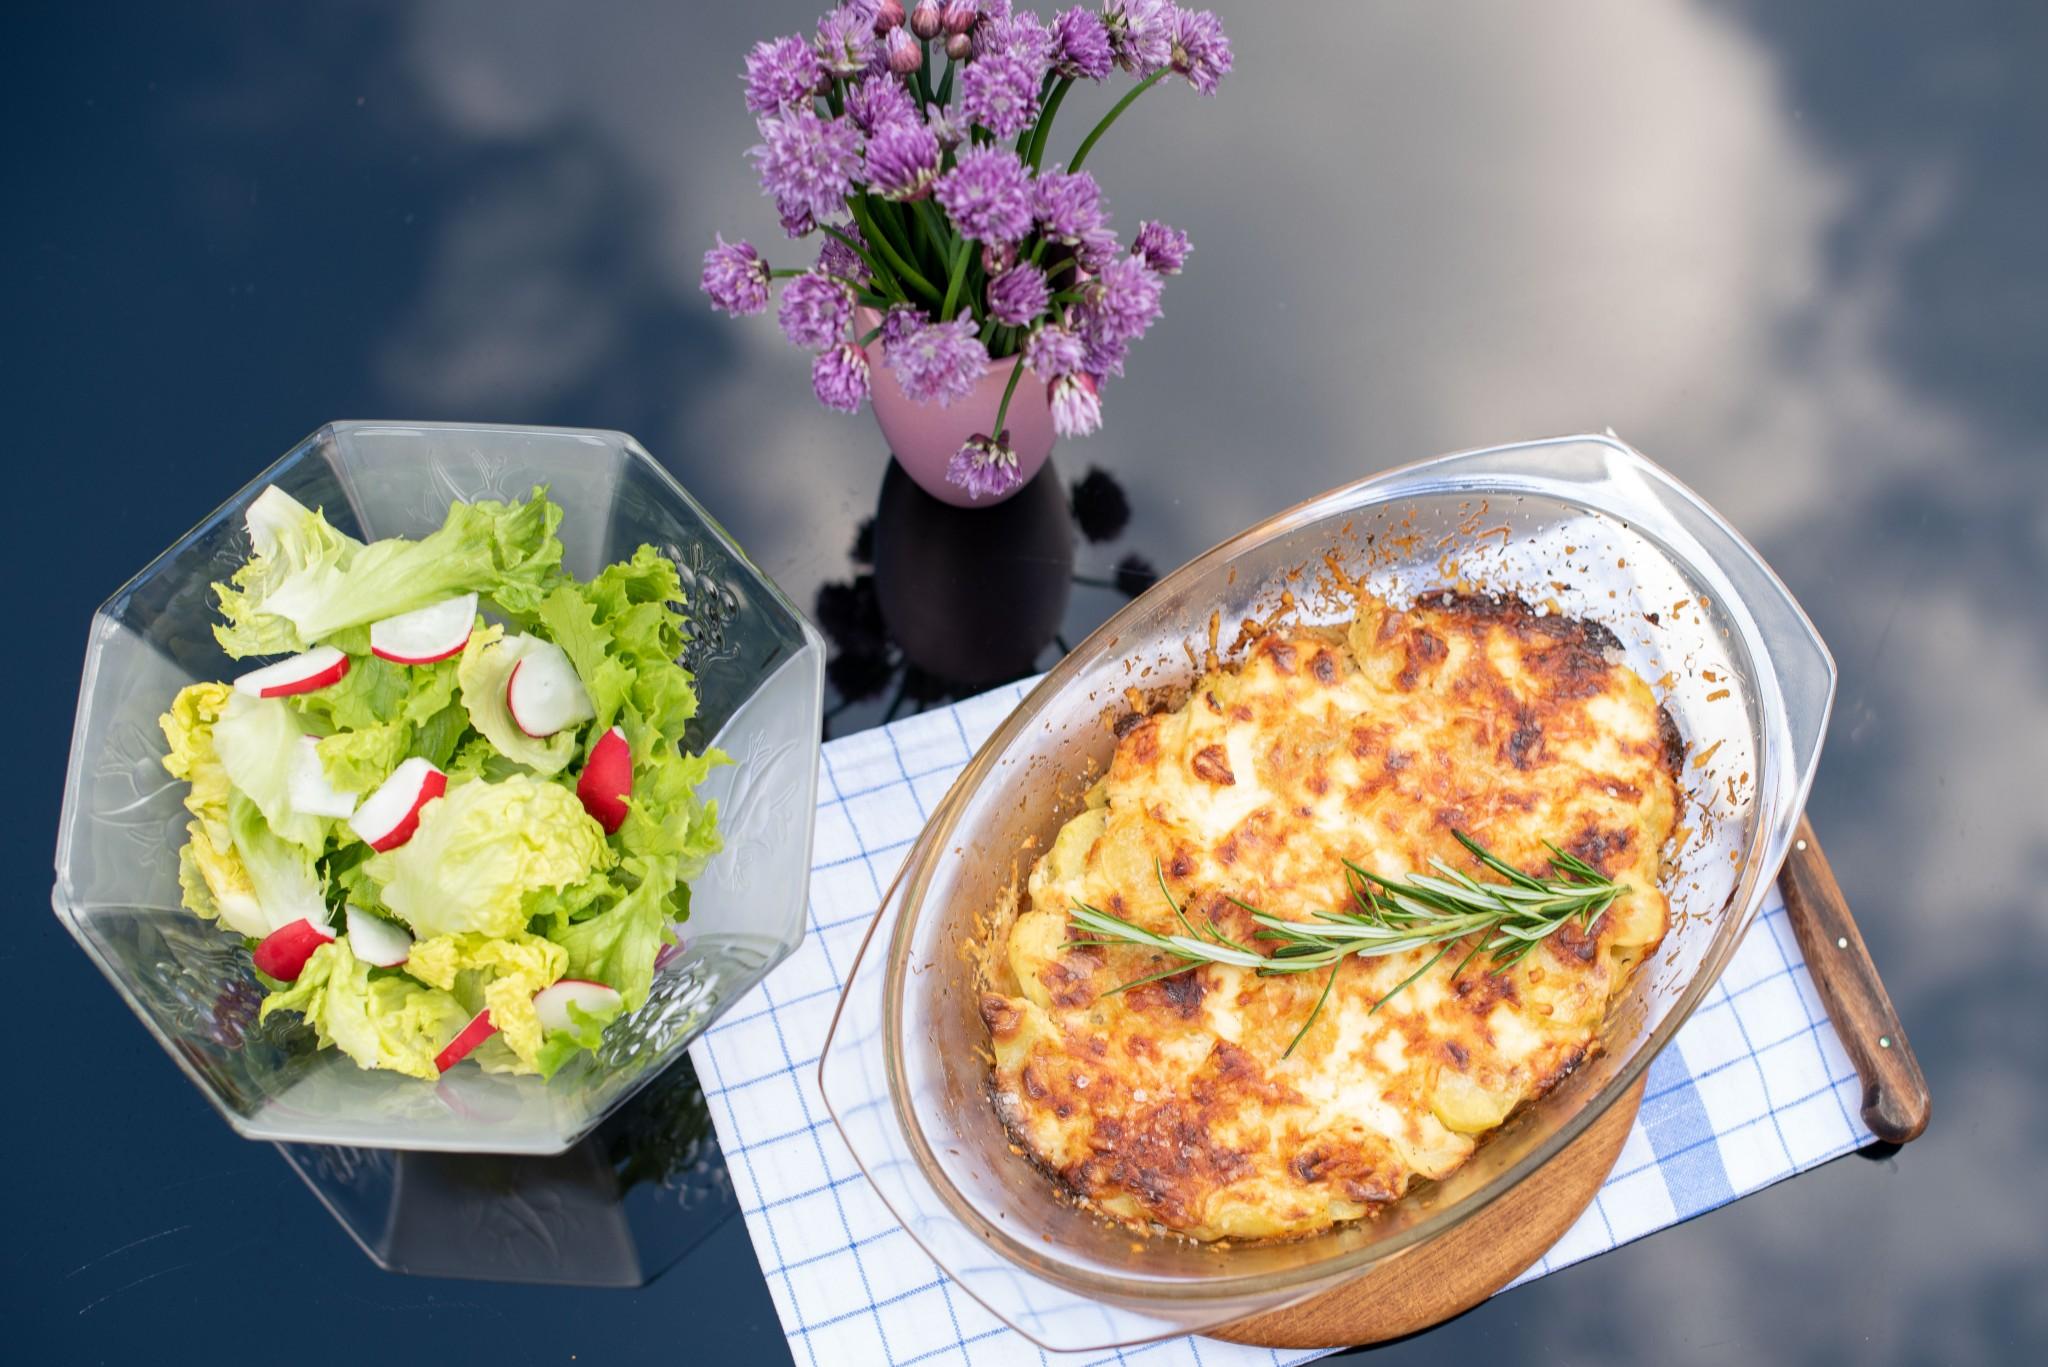 Kartoffelgratin mit Kräutern der Provence